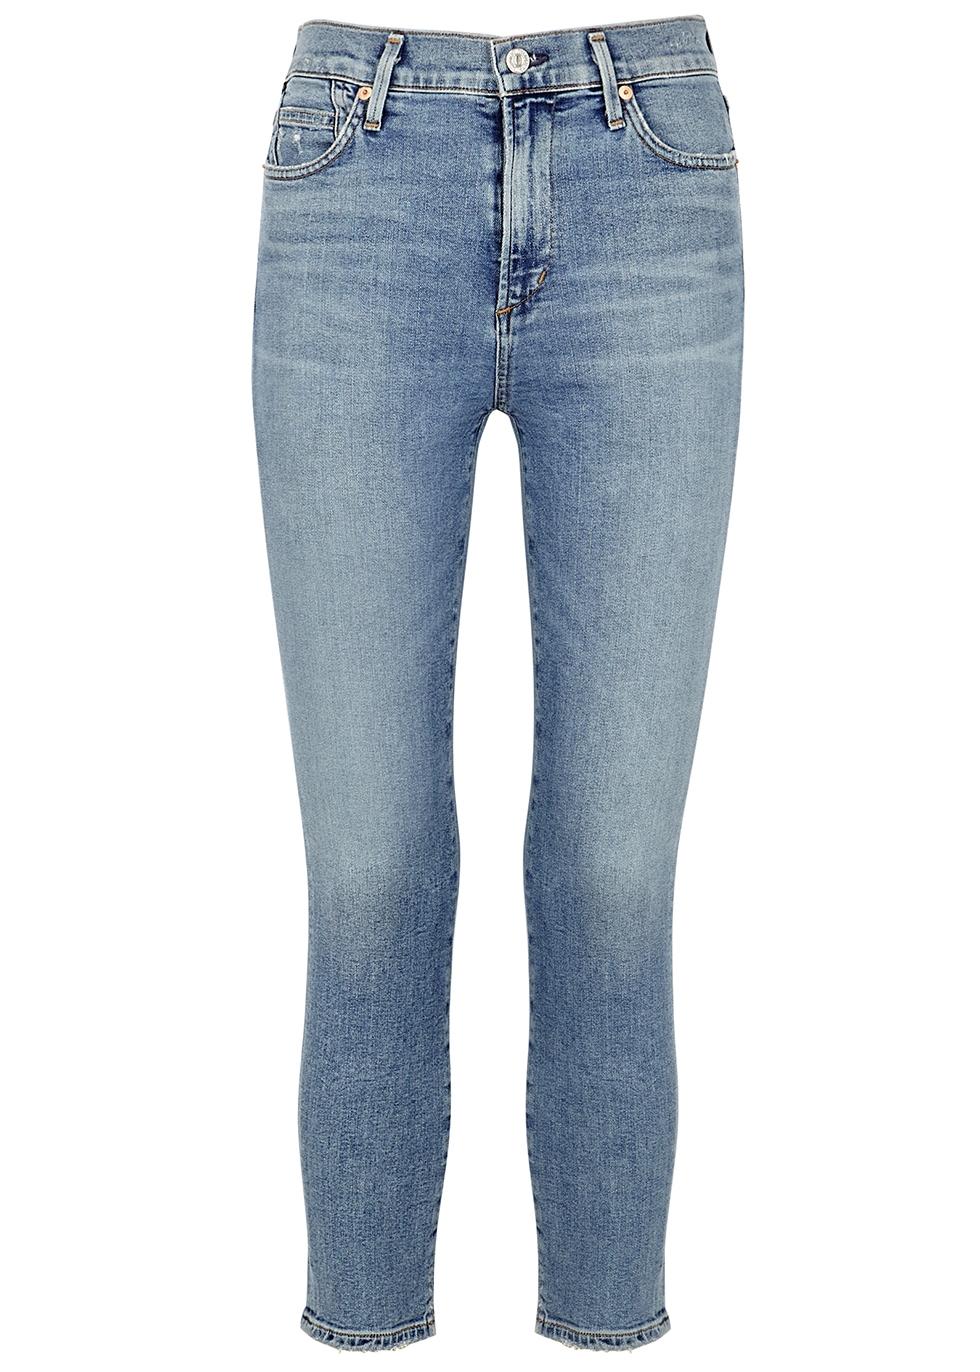 Rocket light blue cropped skinny jeans